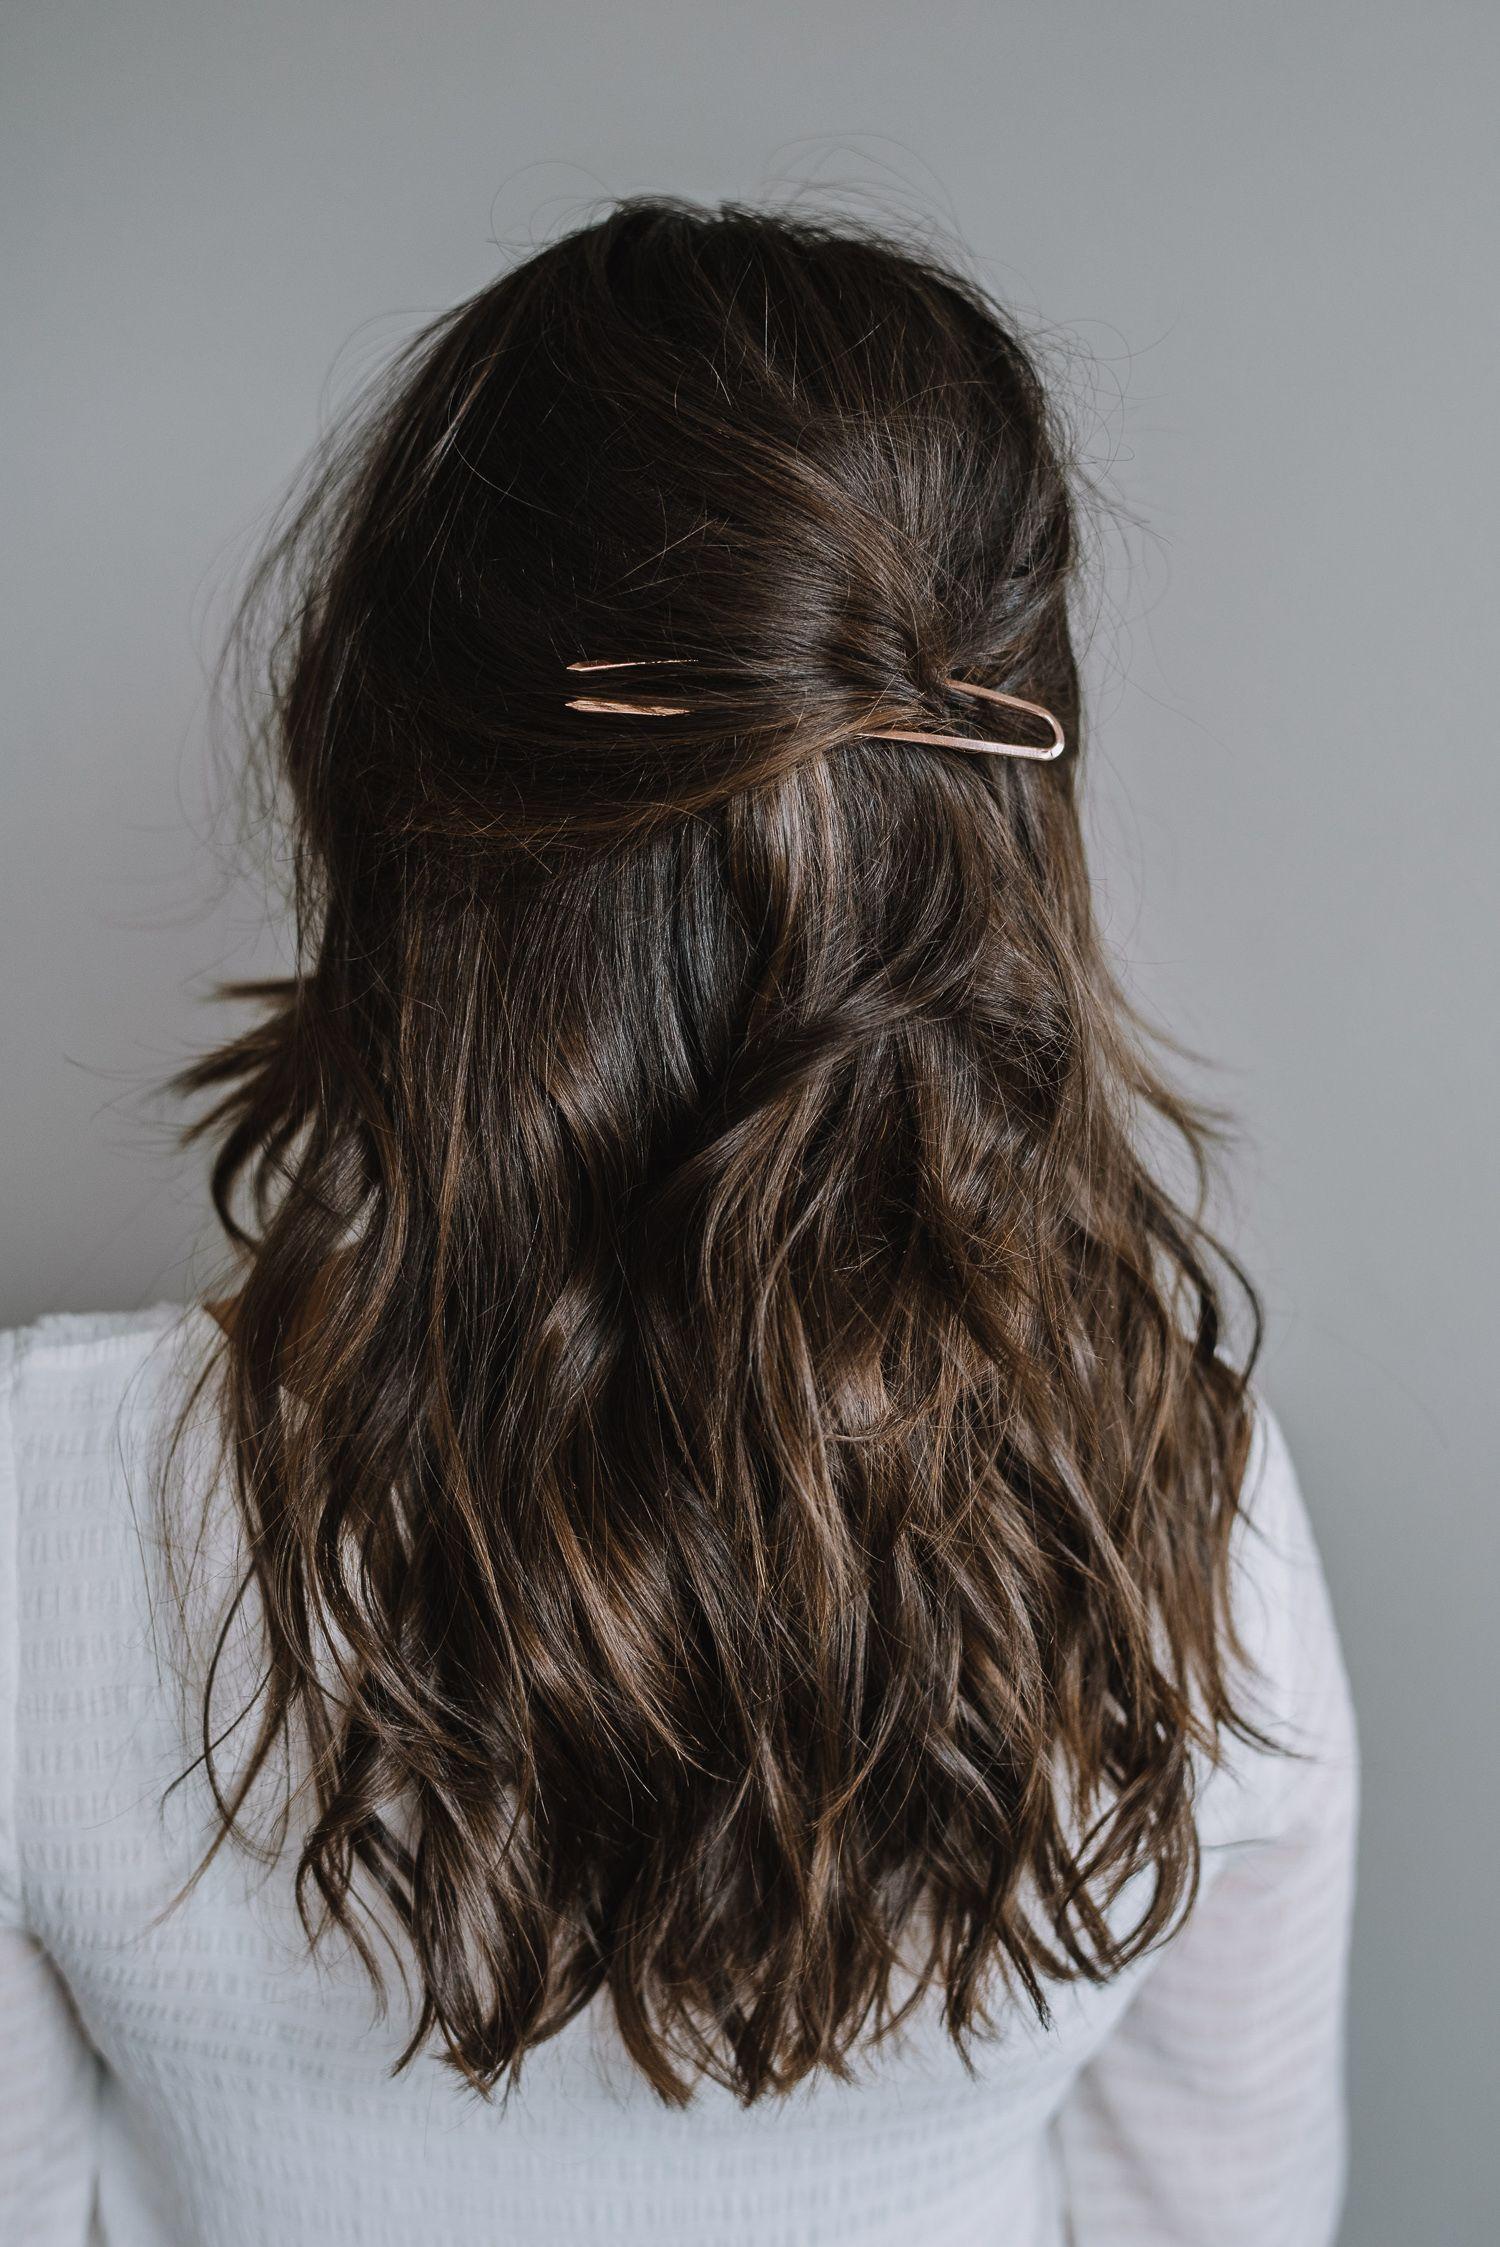 2019 year lifestyle- Hair holiday tutorials pinterest